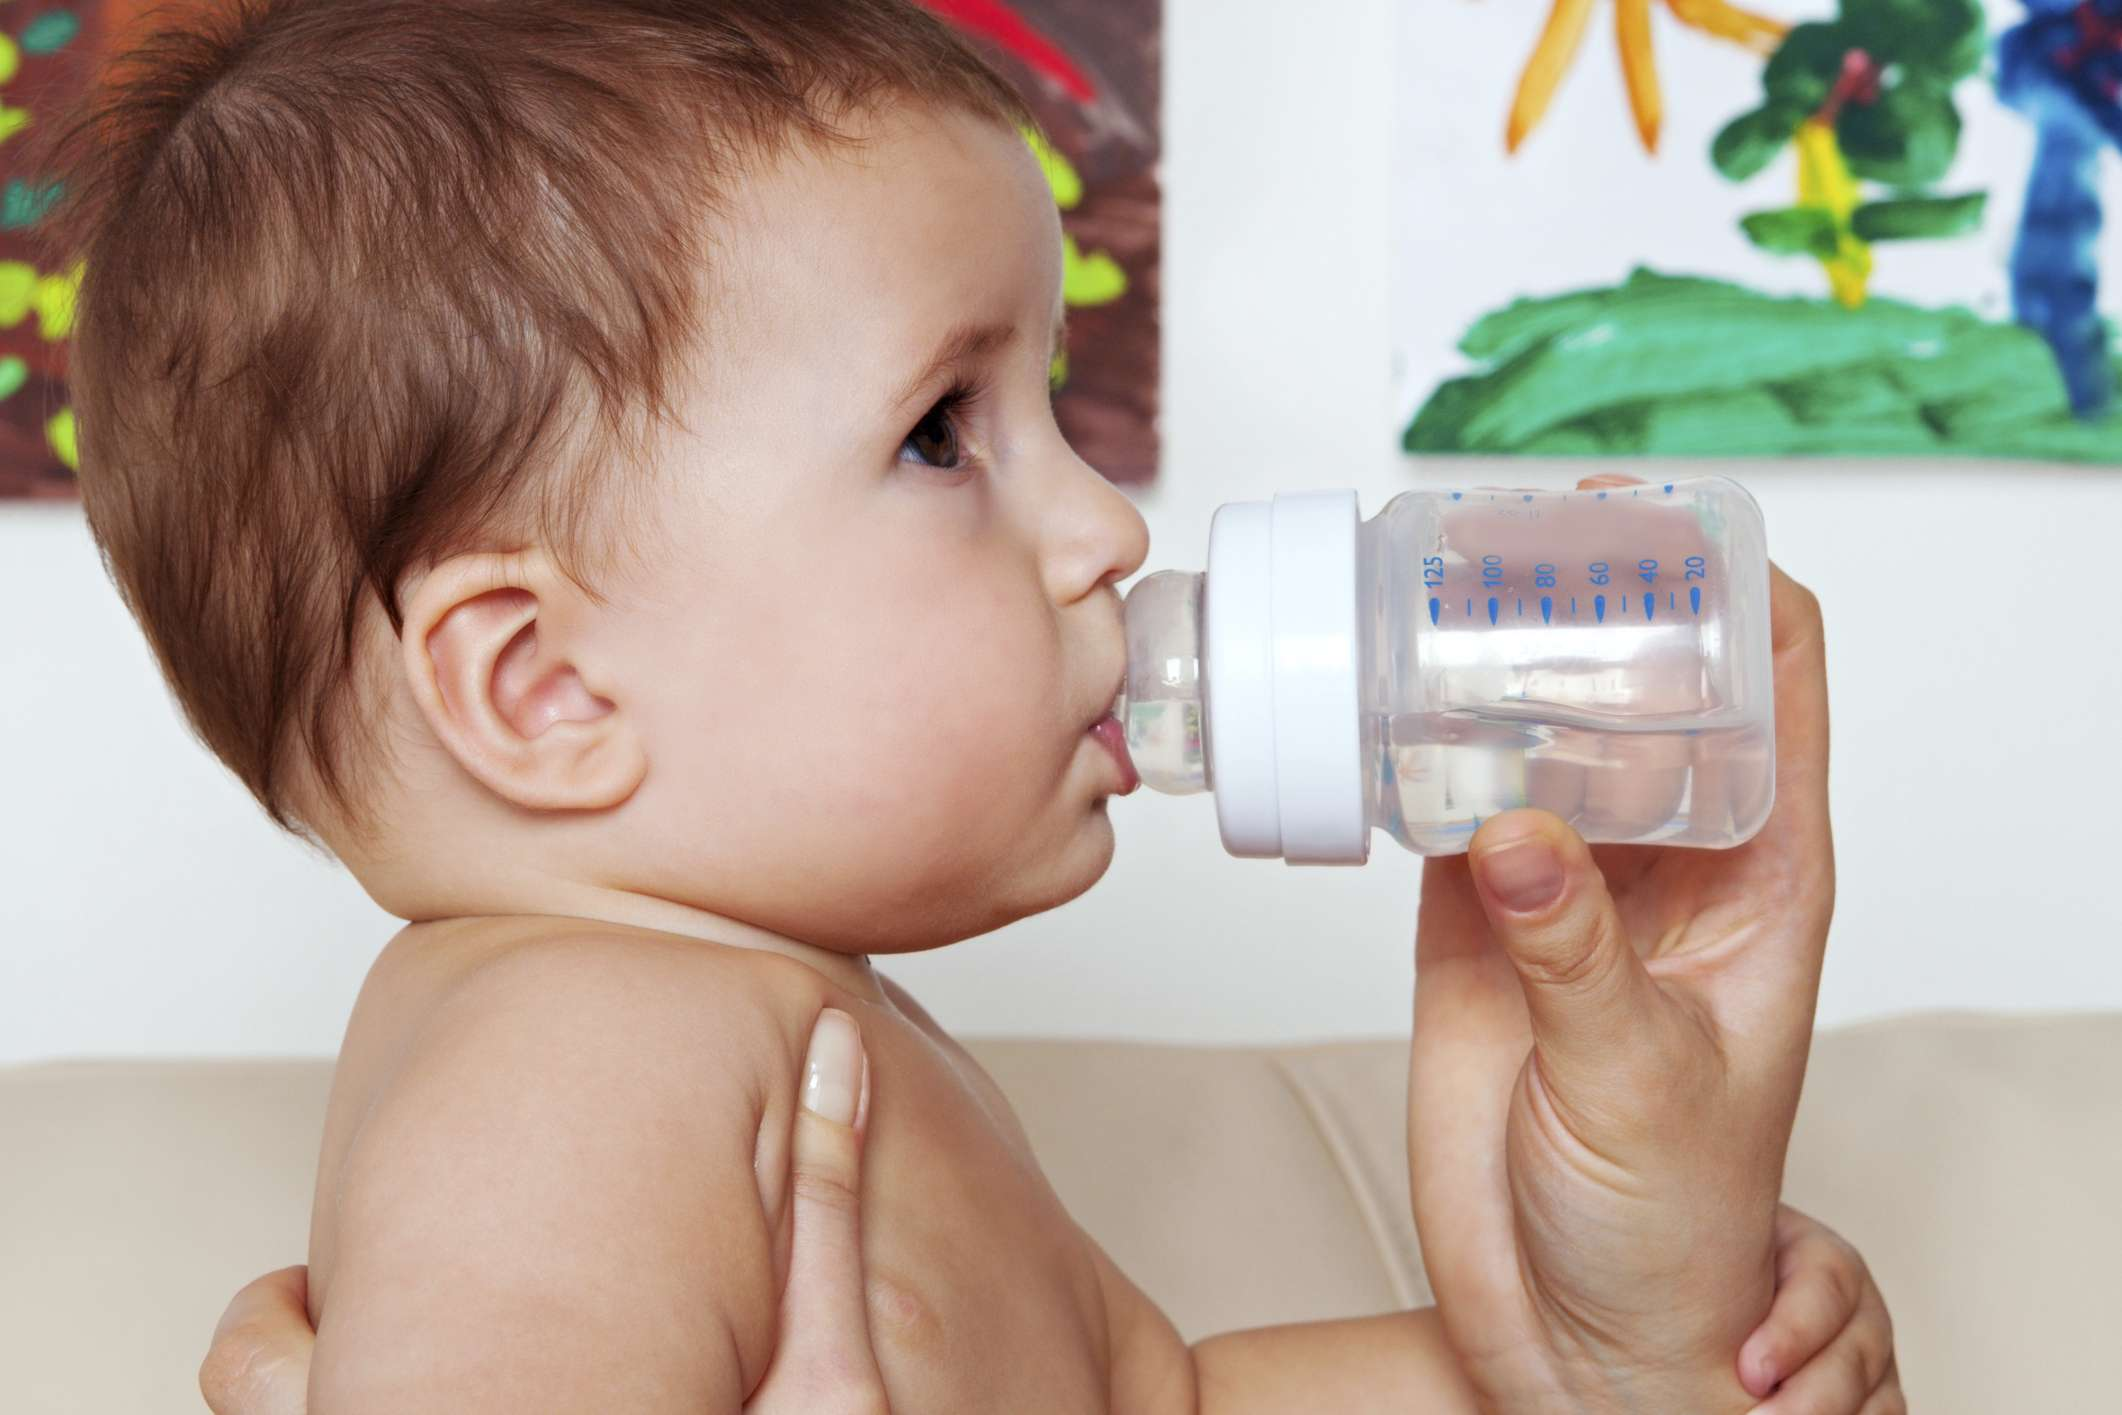 salud bucal nino Foto: Shutterstock